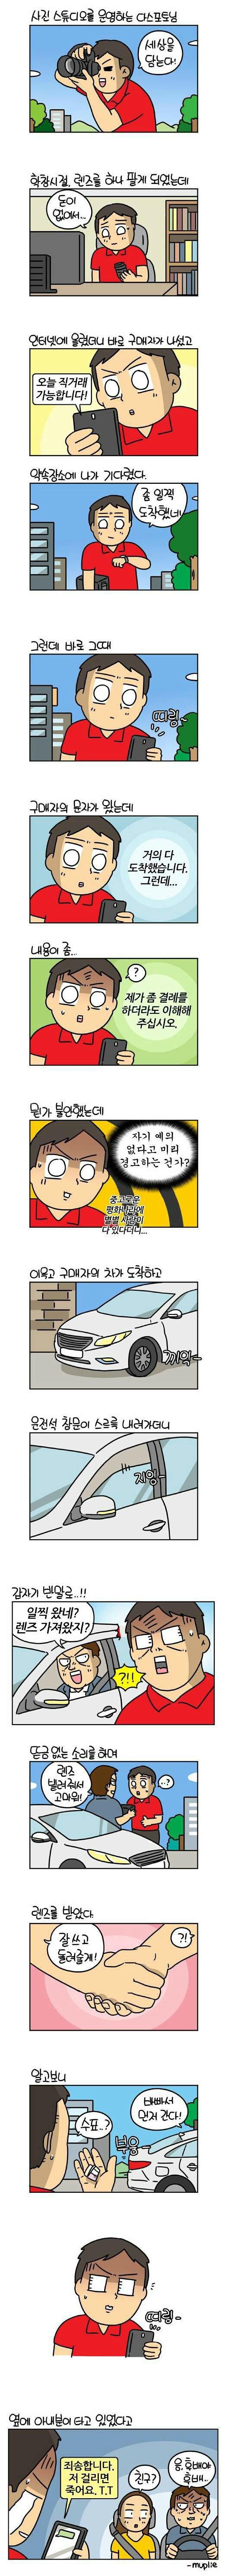 15e2cf4ac63493a2c.jpg [펌] 유부남 중고거래 전설.jpg